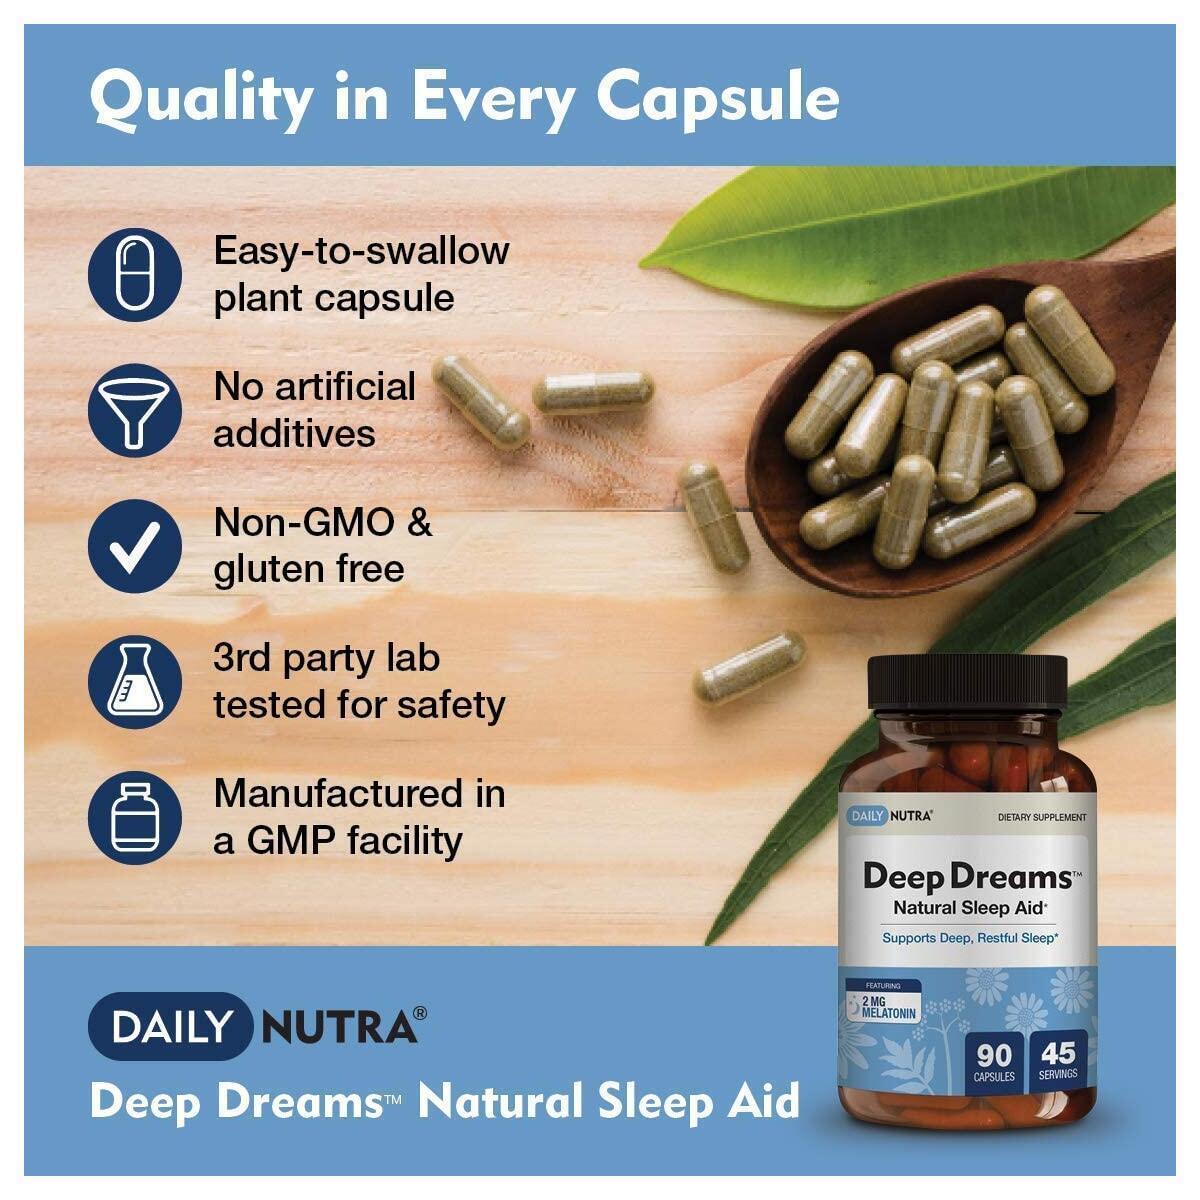 Deep Dreams Natural Sleep Aid by DailyNutra - Deep, Restful Sleep Supplement - Non-Habit Forming Sleeping Pills | with Melatonin, L-Tryptophan, Valerian, GABA, Chamomile, Passionflower